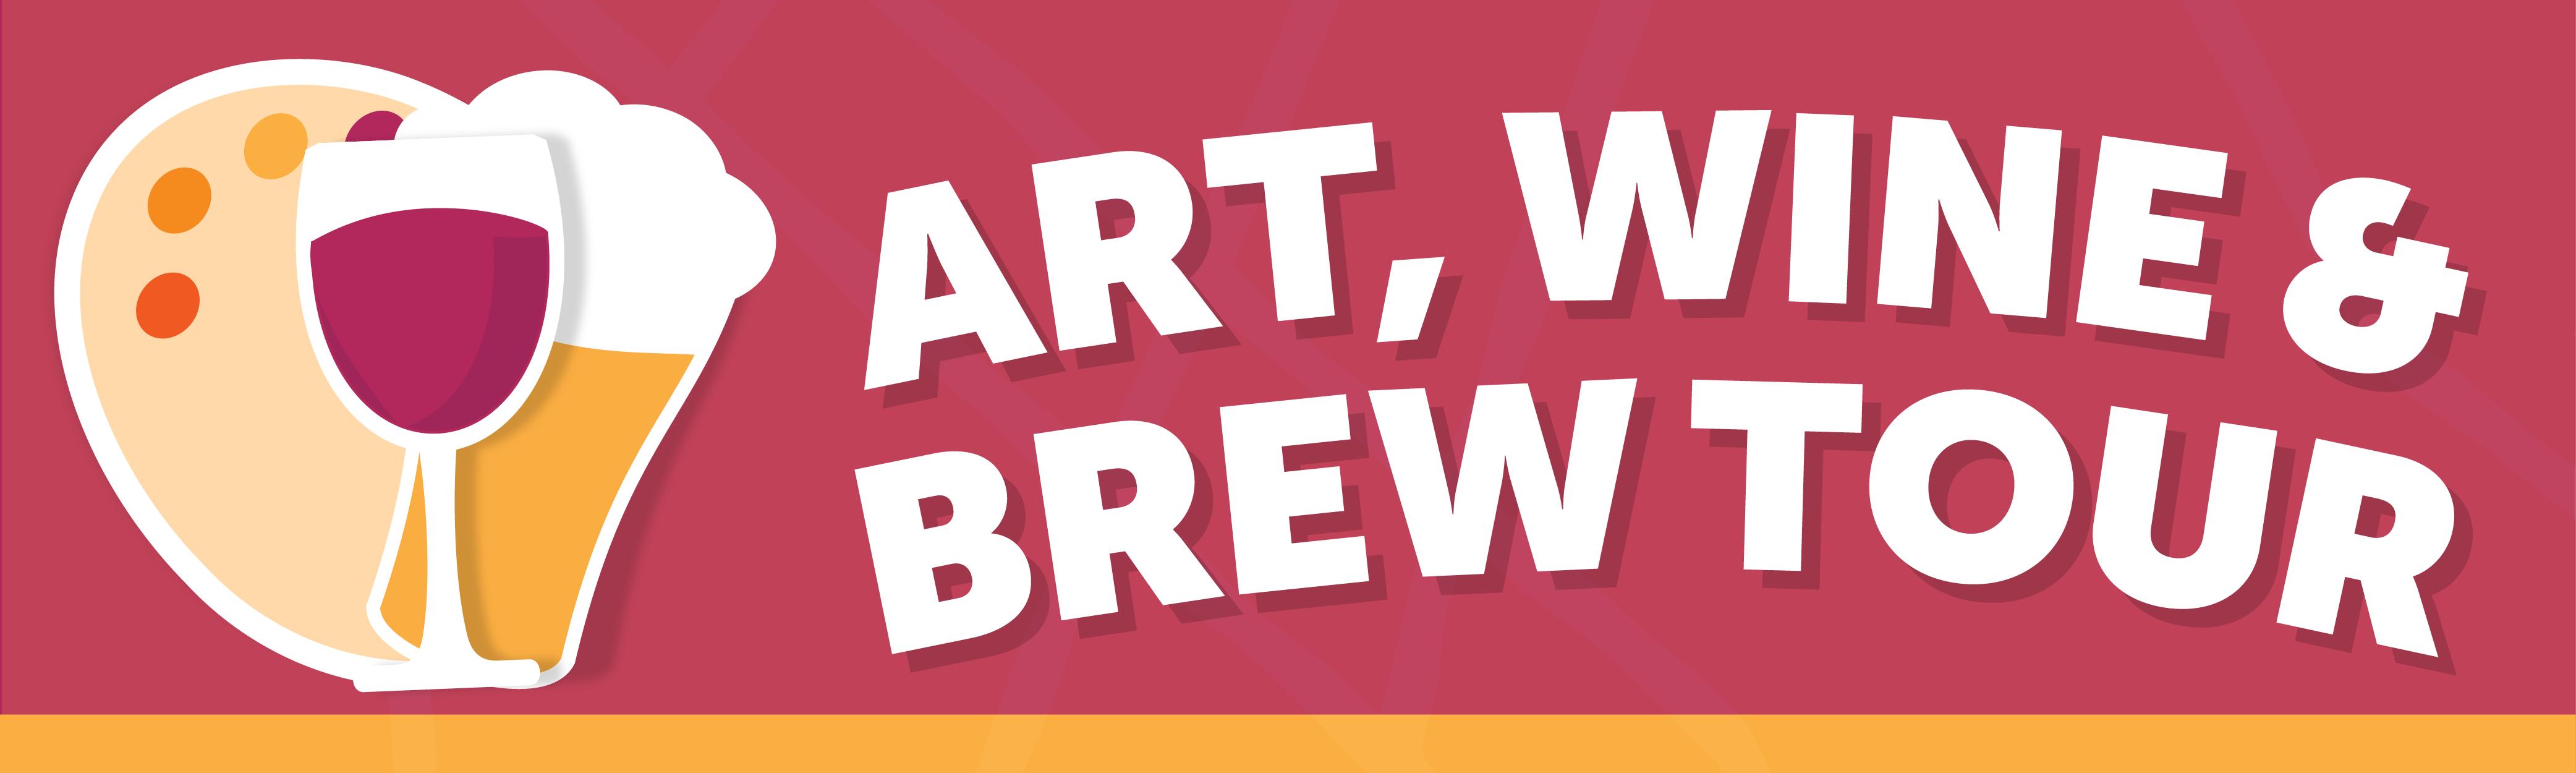 Art-Wine-Brew-Tour-Atascadero-Cover-01